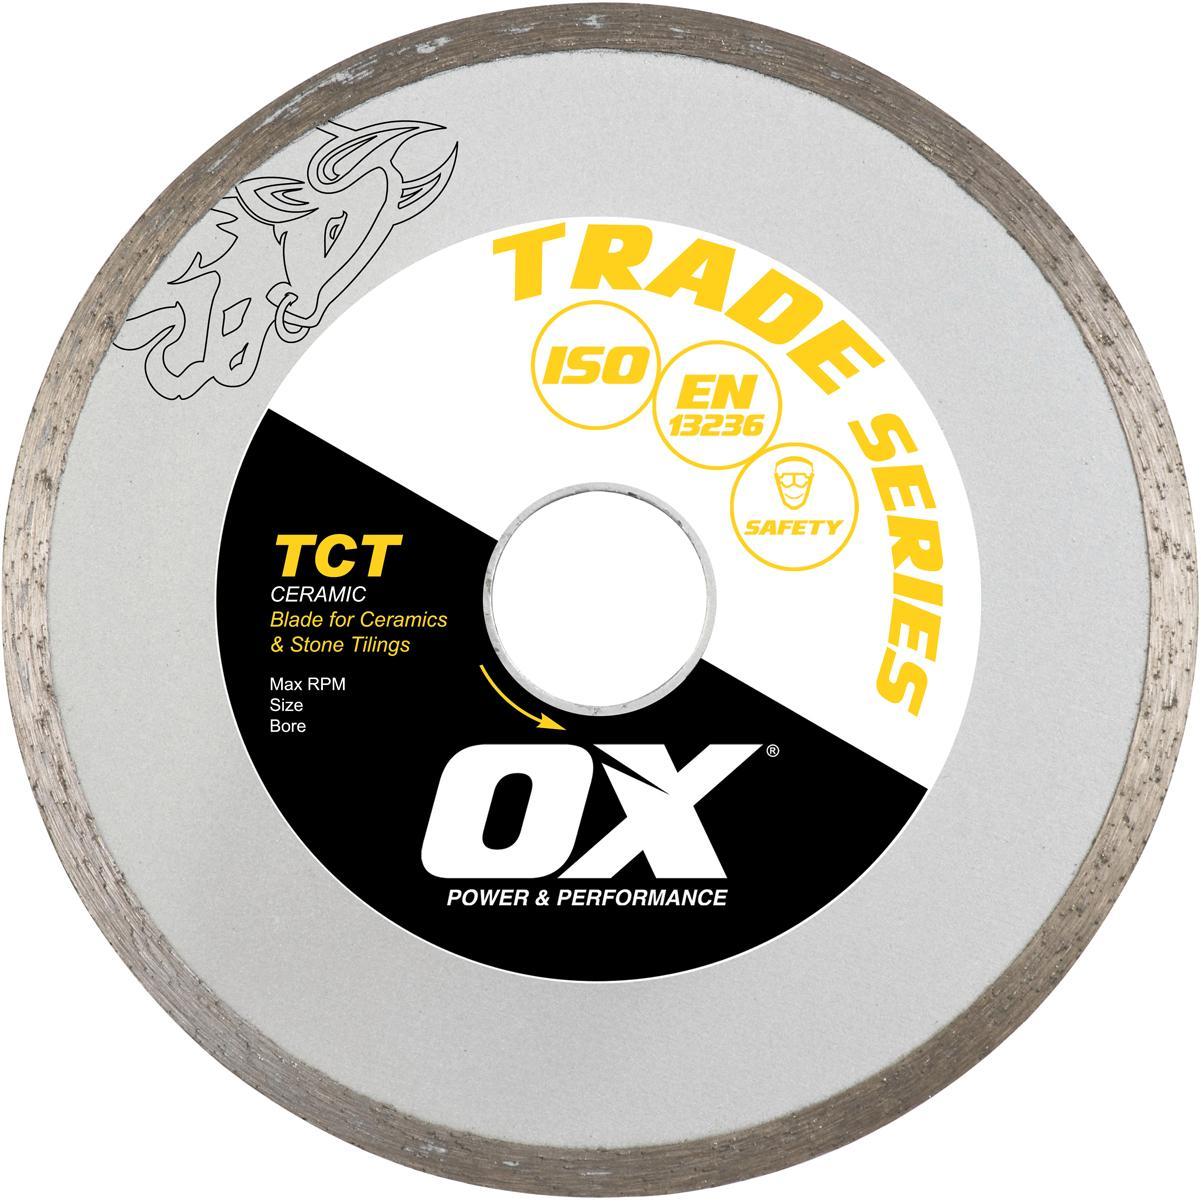 "Trade TCT 9"" Continuous Rim Diamond Blade - Ceramics by Ox"